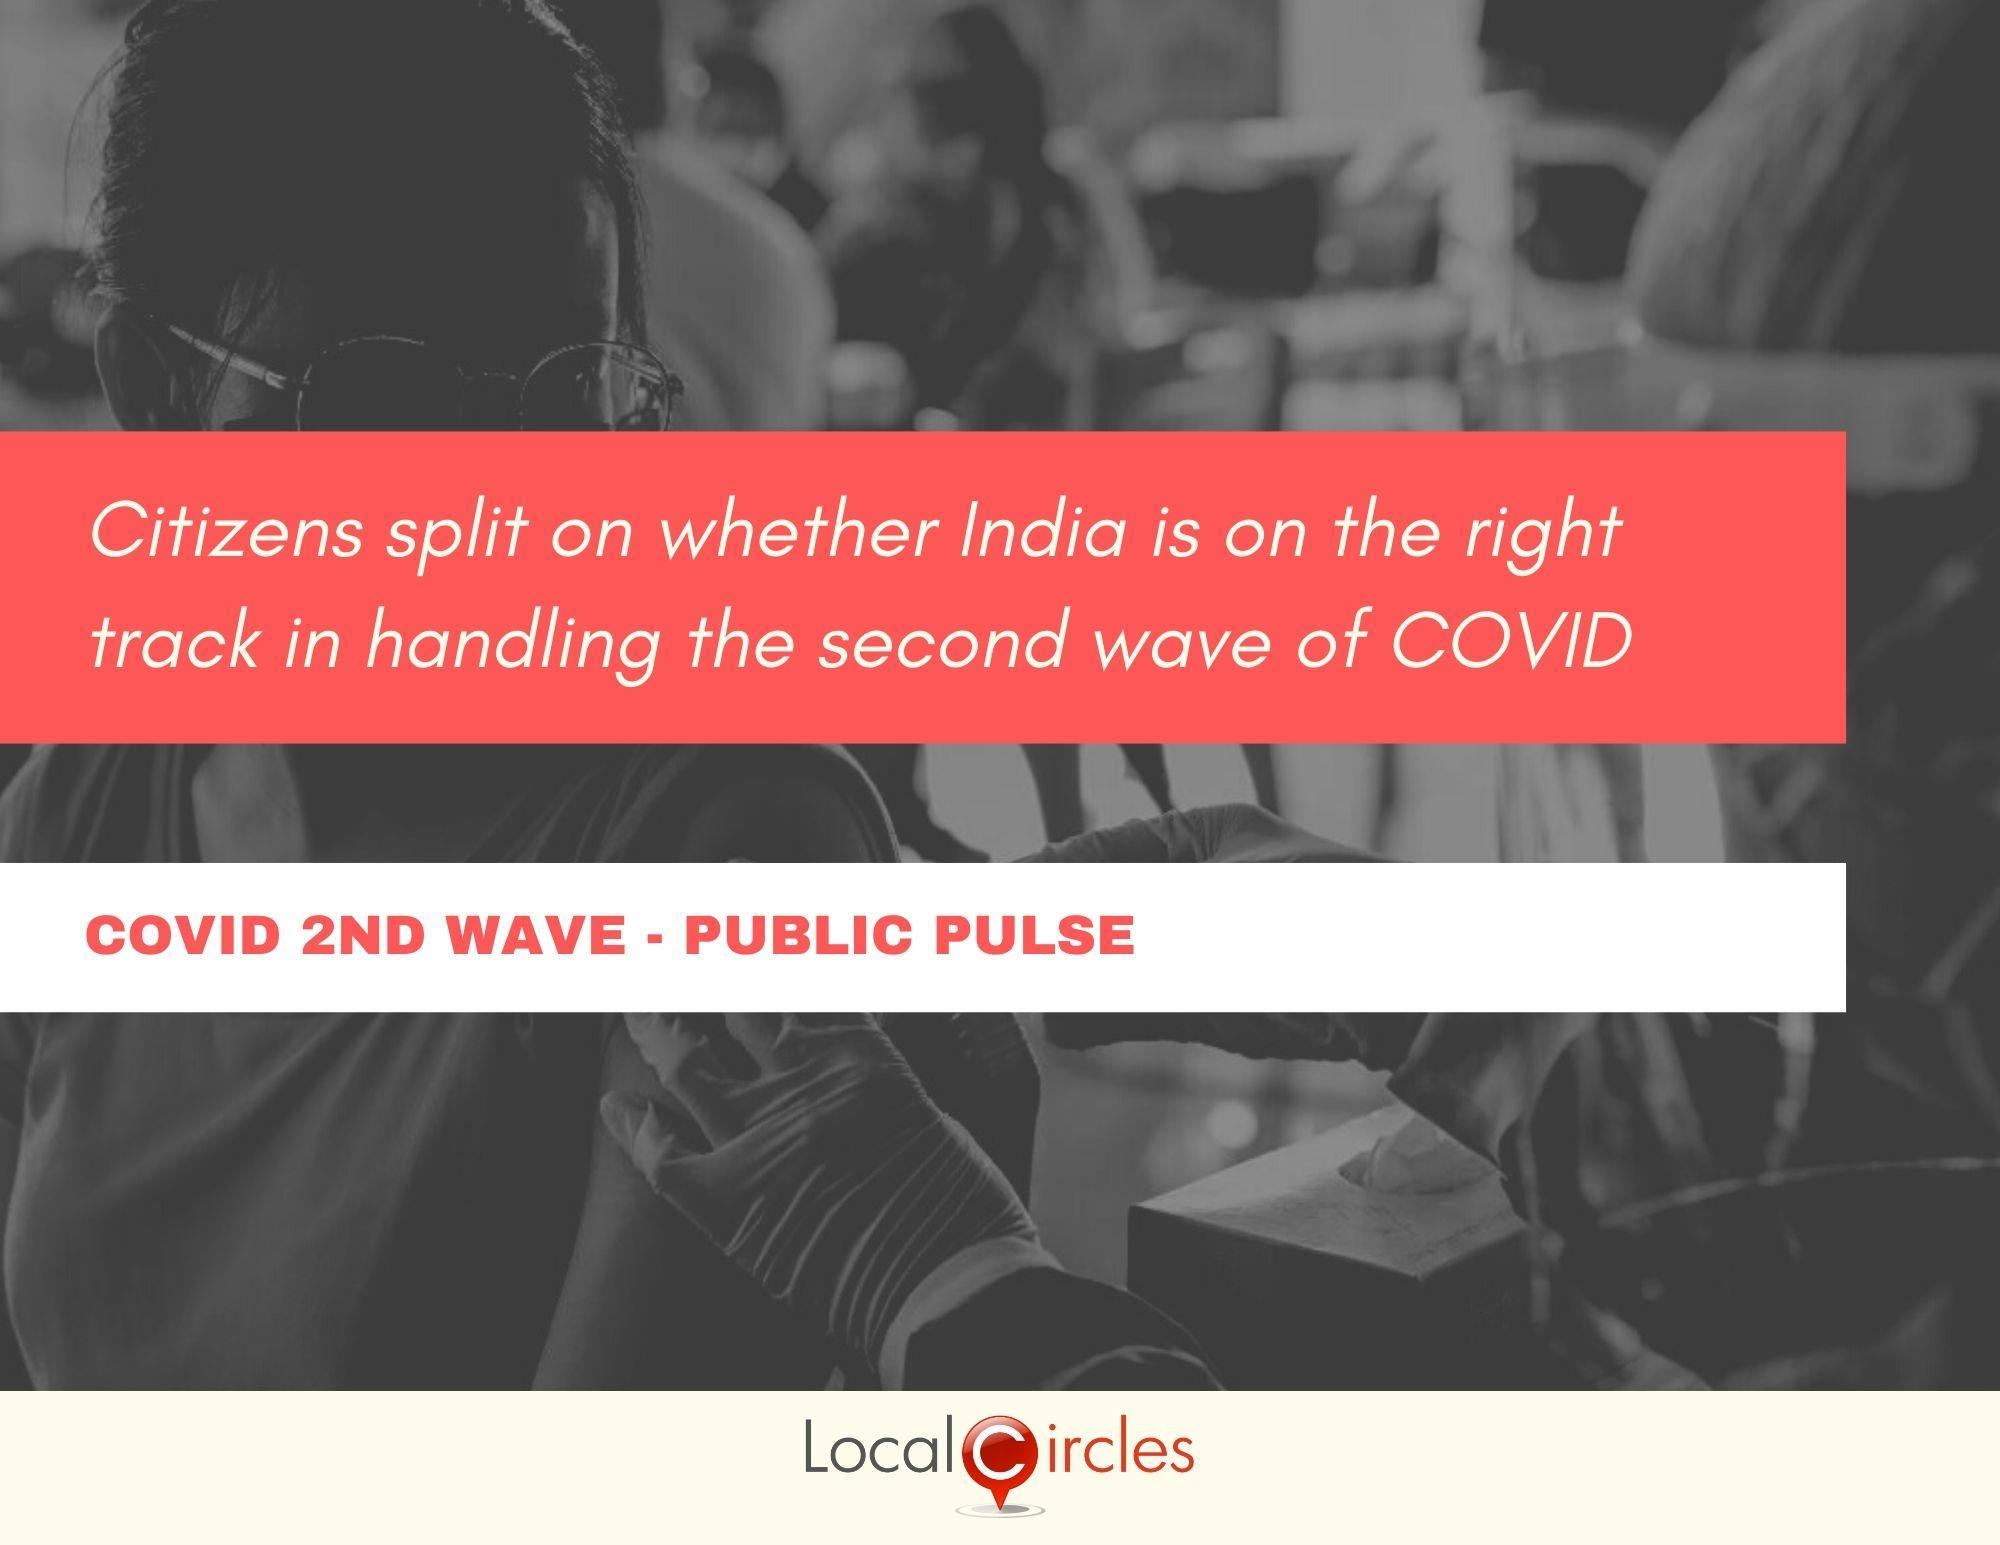 via_LocalCircles_COVID_2nd_Wave_-_Public_Pulse_2___20210505032745___.jpg